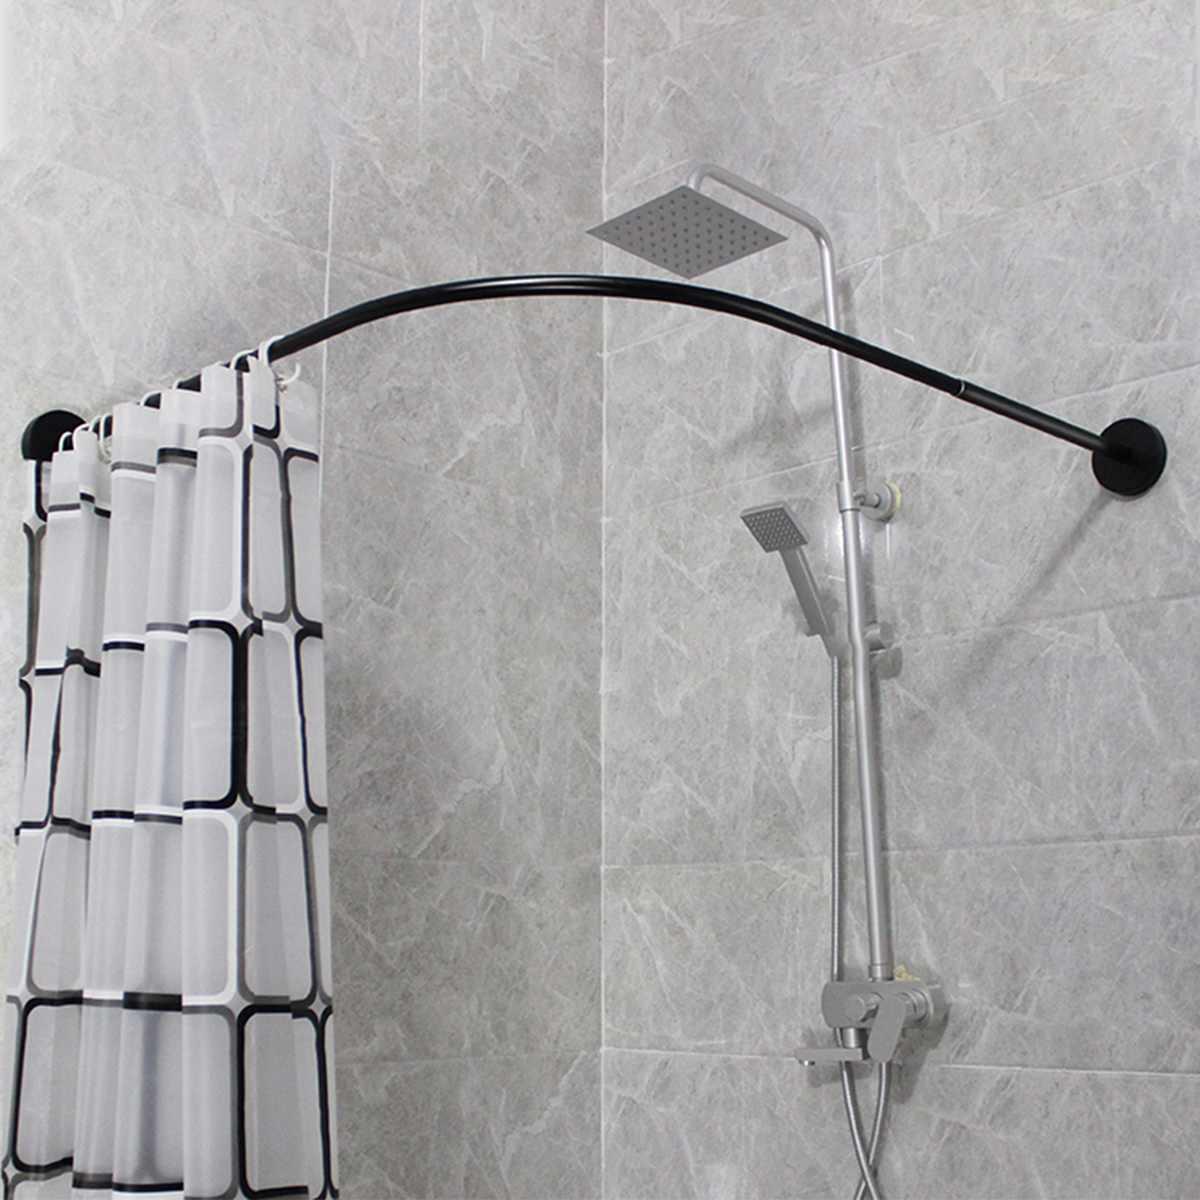 Extendable Corner Shower Curtain Rod Pole 90 130cm Stainless Steel ...